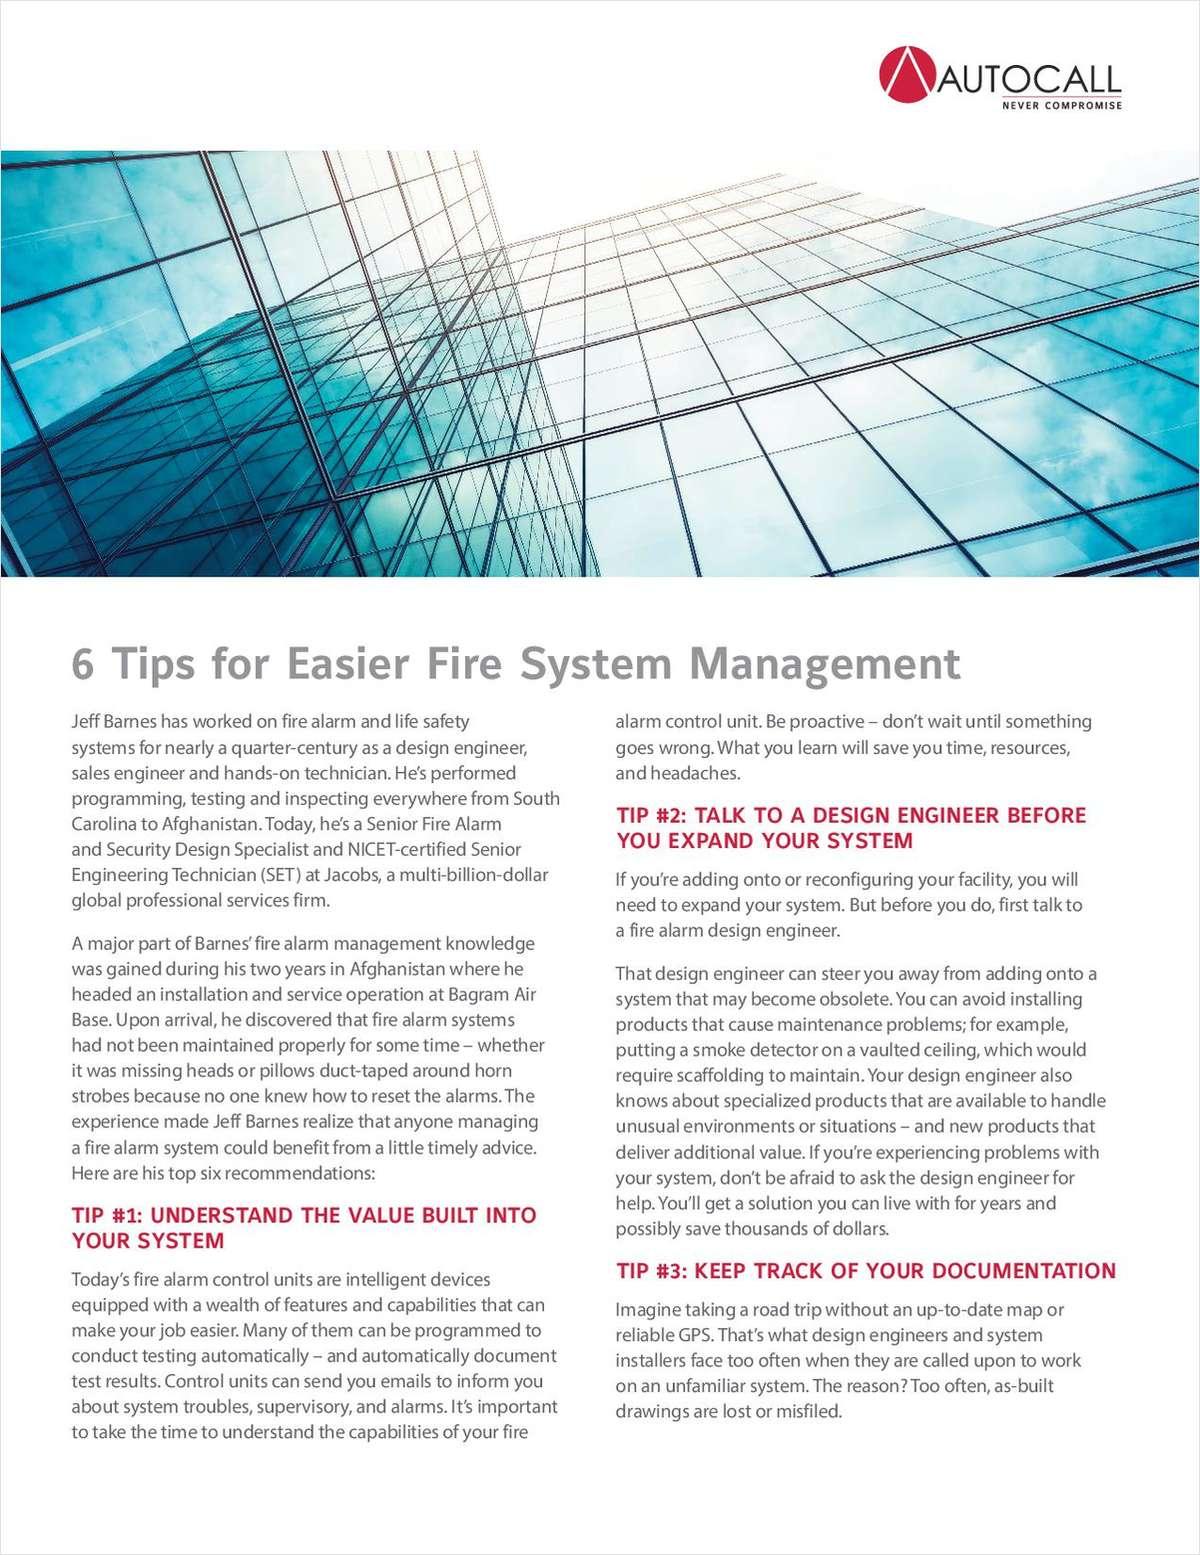 6 Tips for Easier Fire System Management